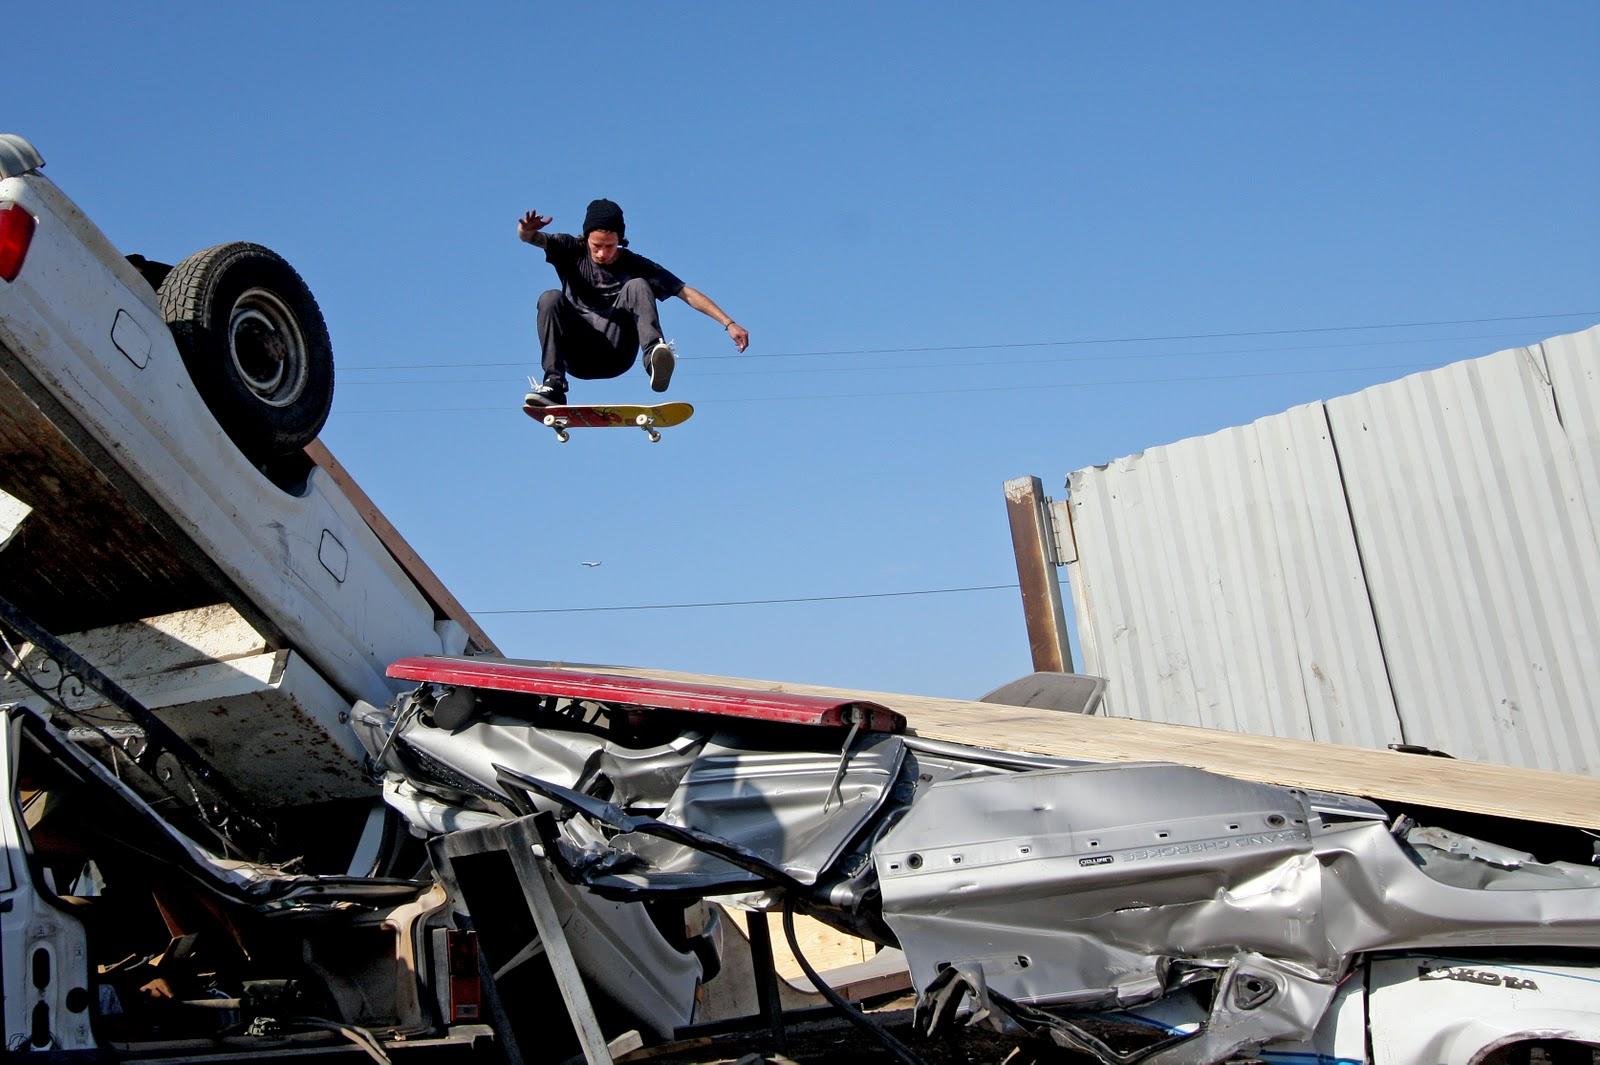 http://2.bp.blogspot.com/-esmOtQmb7es/Tp3mGTLCy7I/AAAAAAAAADo/sxGYL0kIYzk/s1600/mikey+gray+front+side+flip+relief+skate+supply.jpg